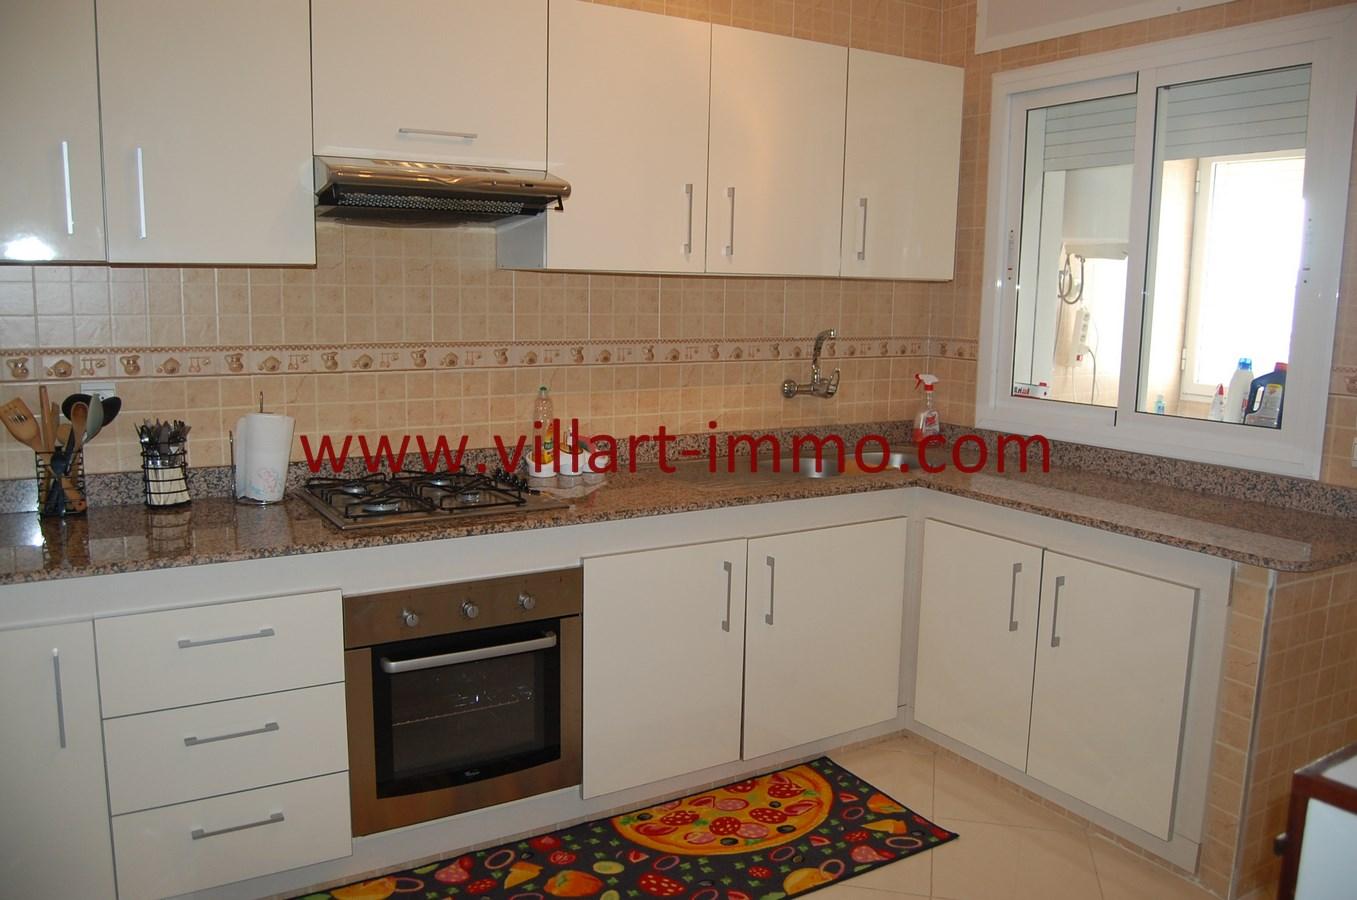 7-Vente-Appartement-Tanger-Route de Rabat-Cuisine 1-VA494-Villart Immo